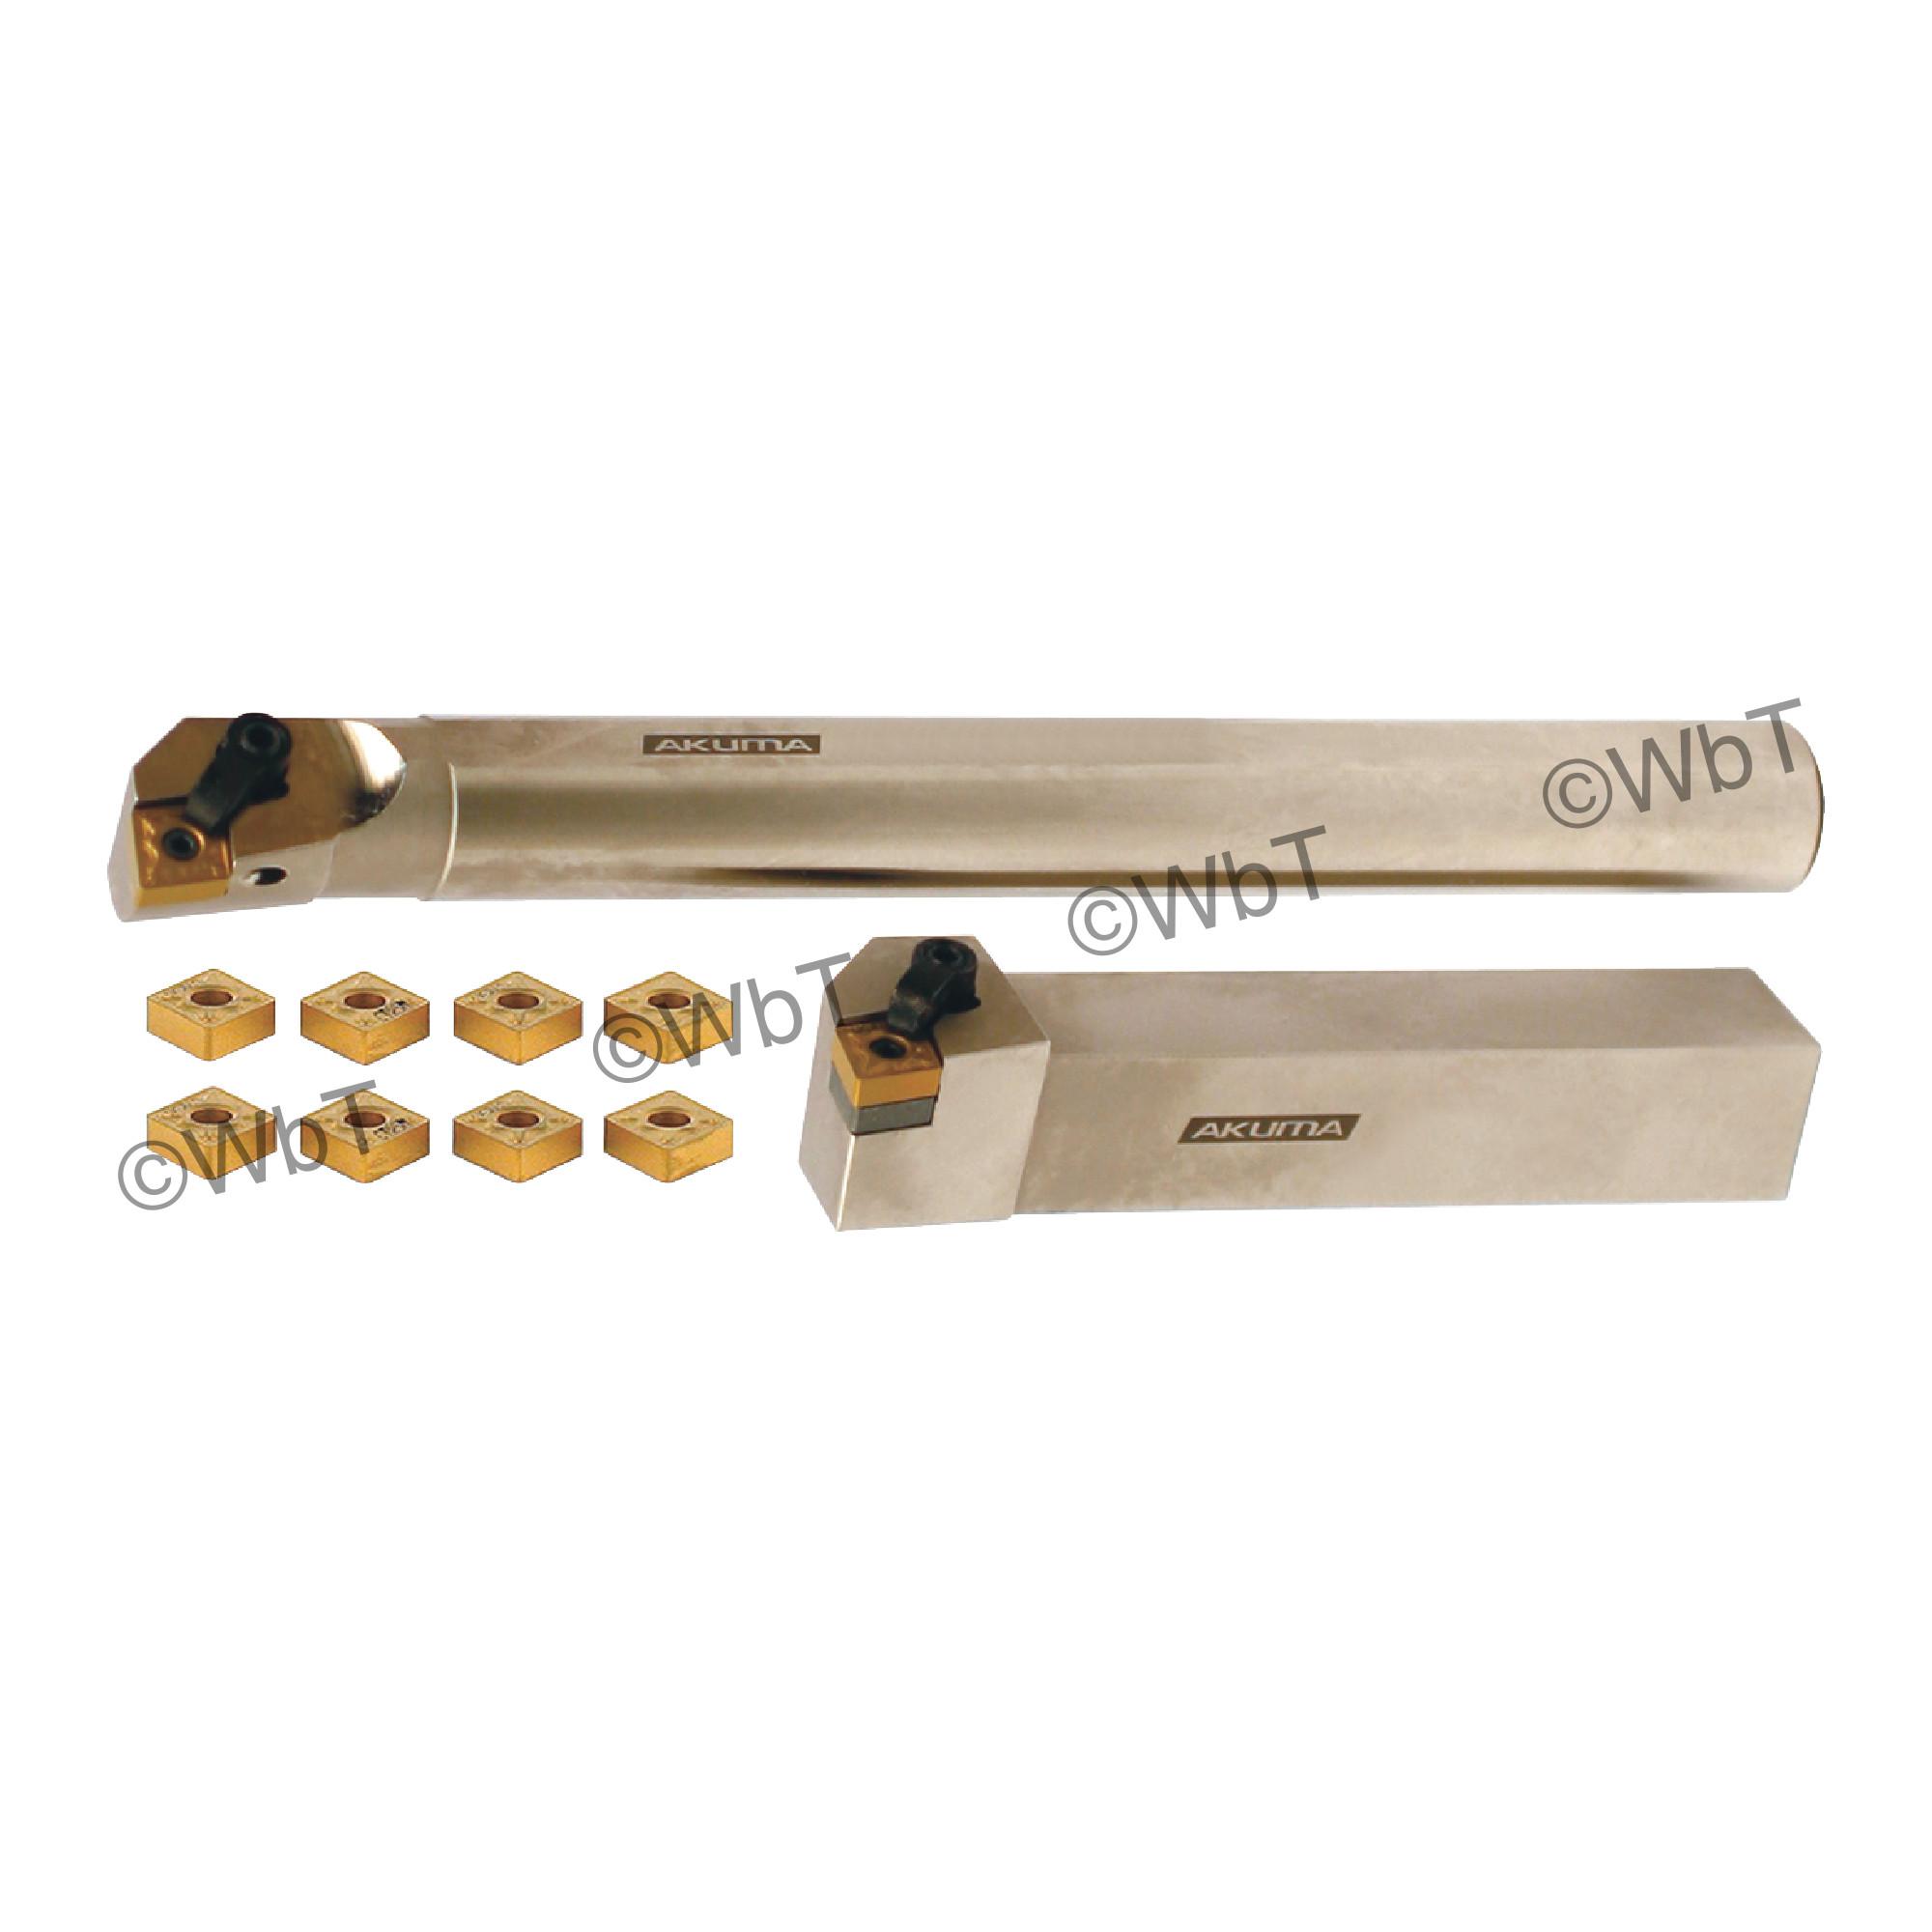 "AKUMA - 1.000"" CNMG43_ Turning & Boring Bar Set / Includes: (1) MCLNR16-4D (1.0"" Tool Holder), (1) A16S-MCLNR-4 (1.0""&os"